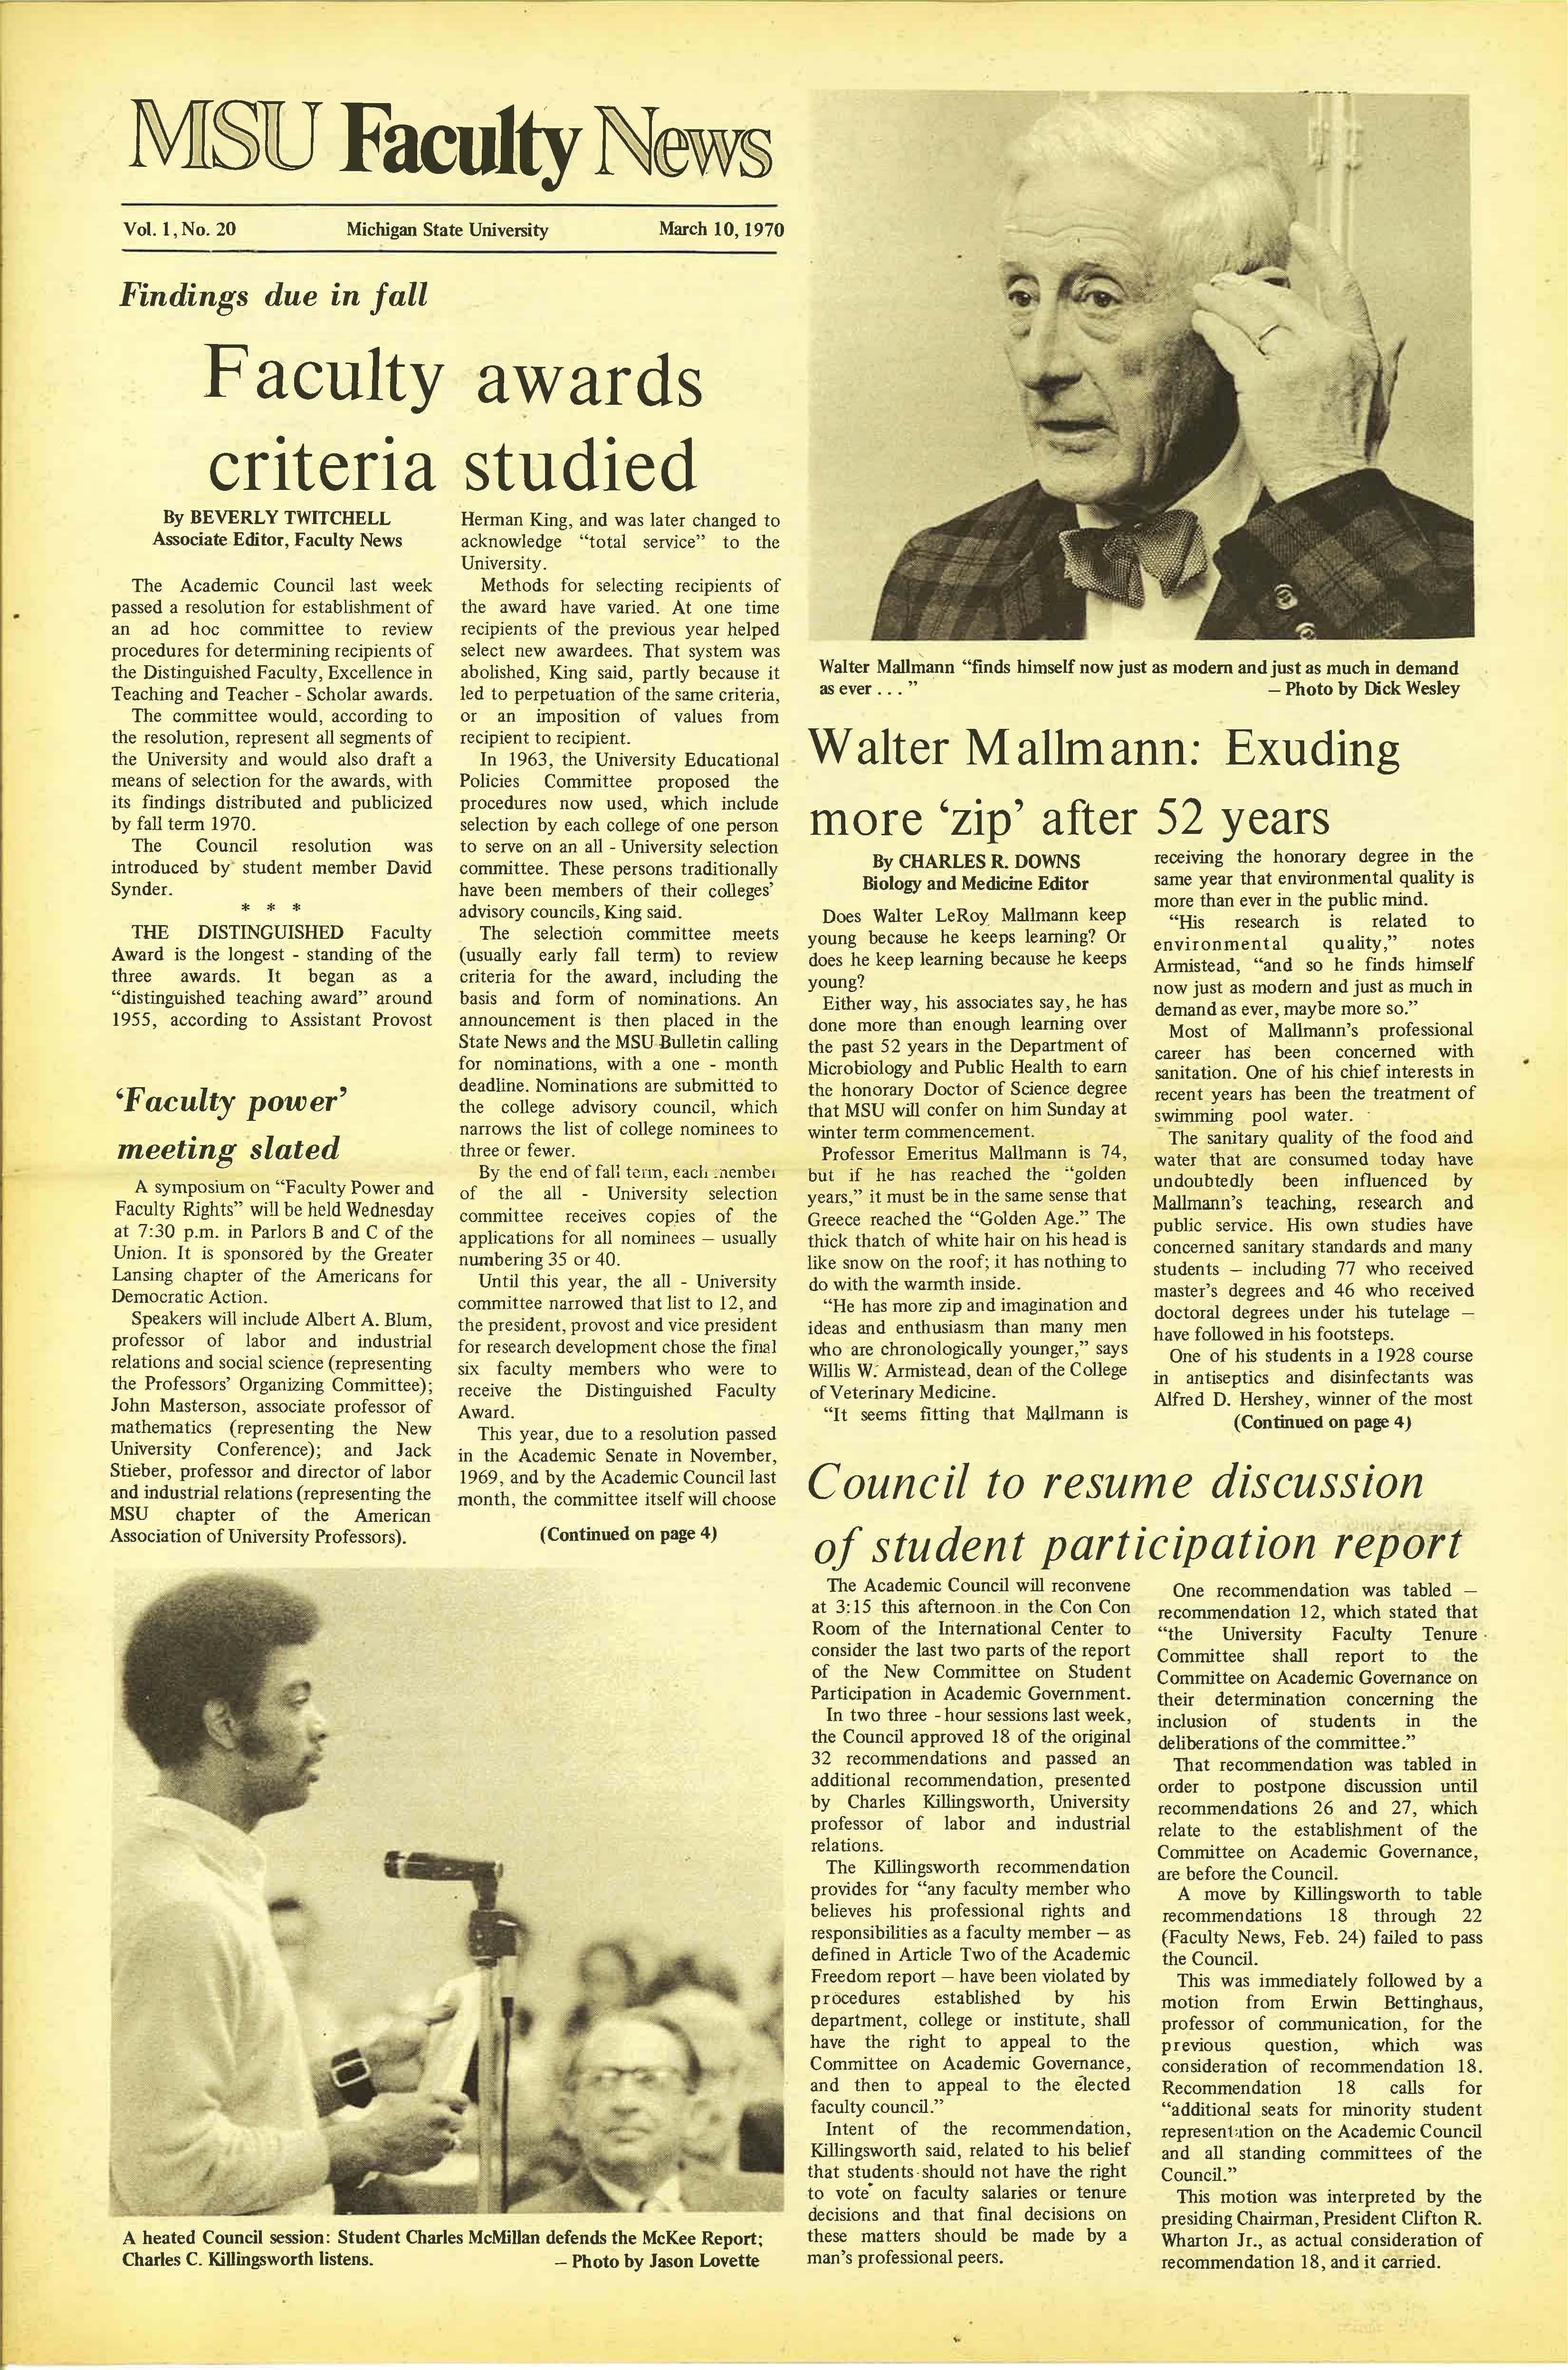 MSU News Bulletin, Vol. 2, No. 3, October 13, 1970